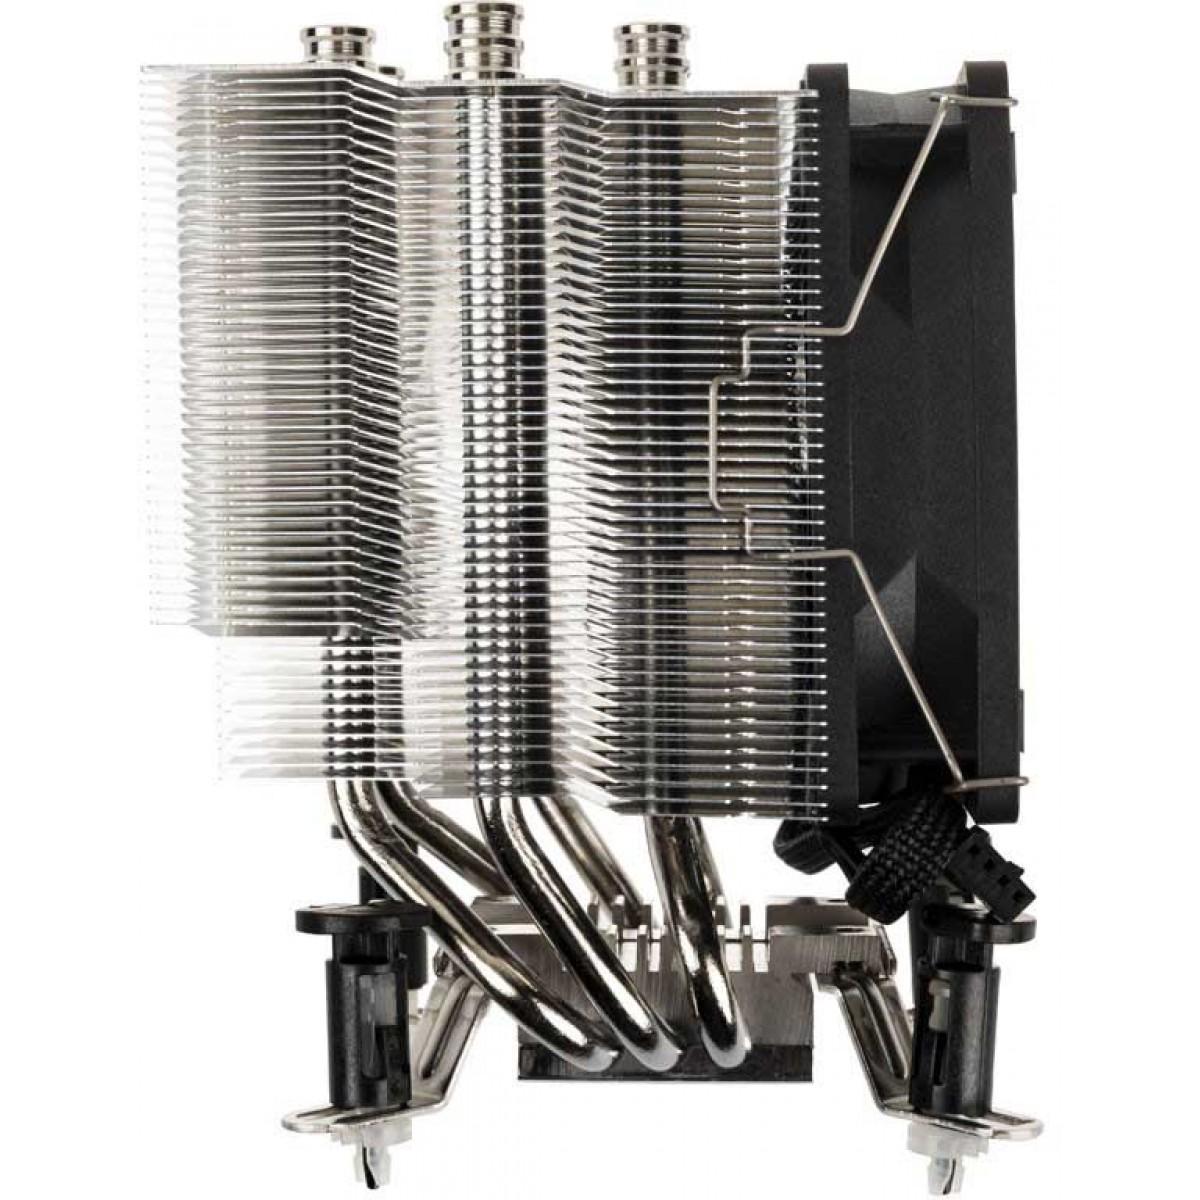 Cooler para Processador Scythe Katana 5 92mm, Intel-AMD, SCKTN-5000